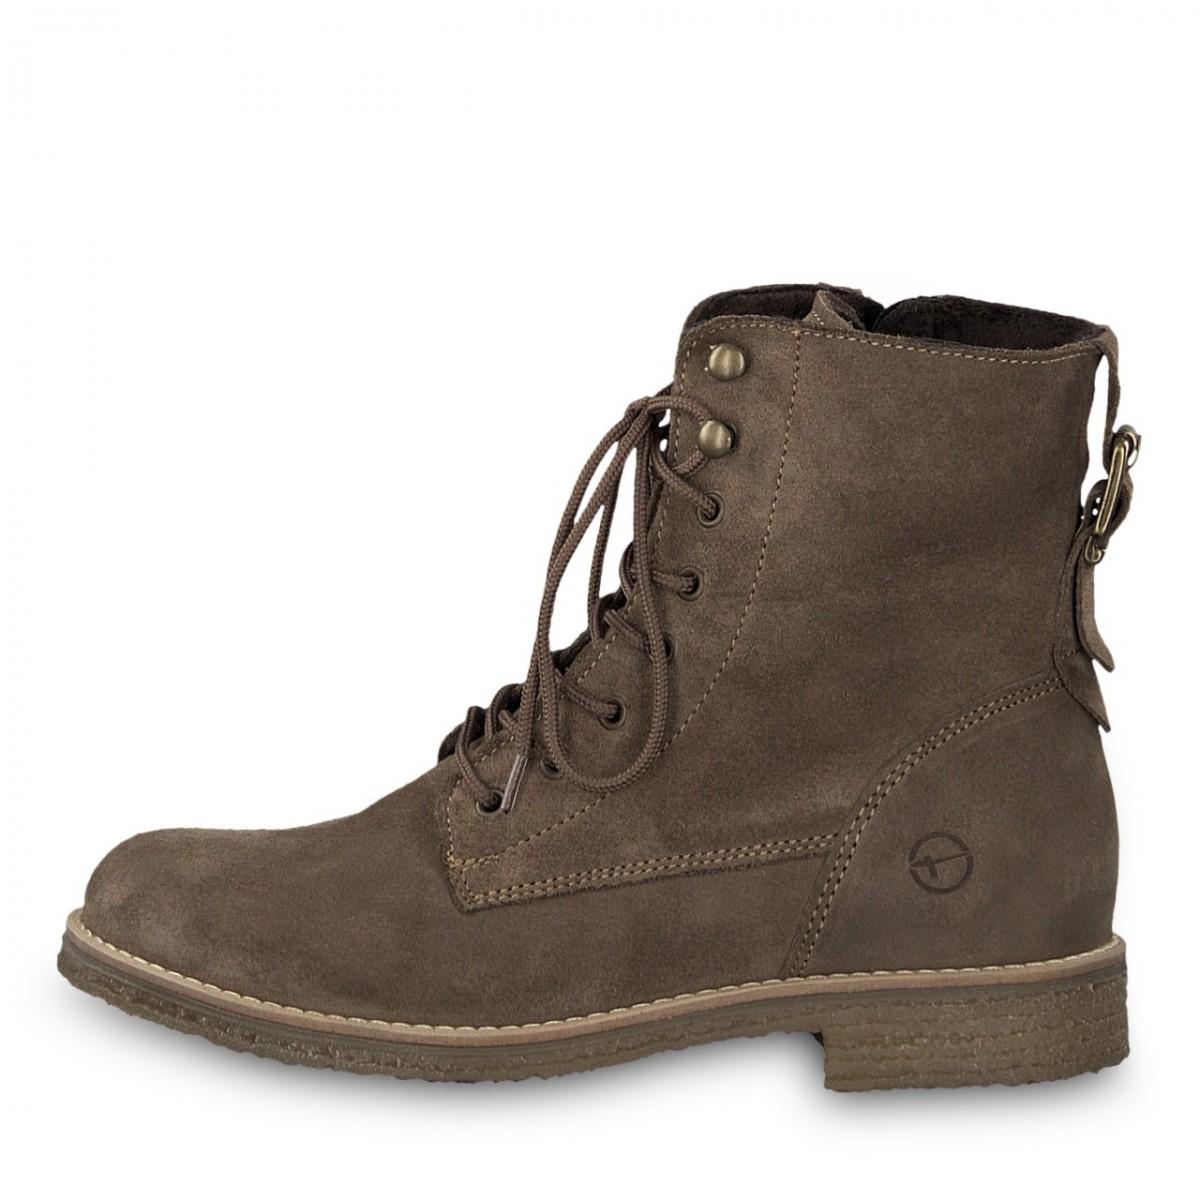 a16c285e9bf995 Tamaris Damen Boots Taupe